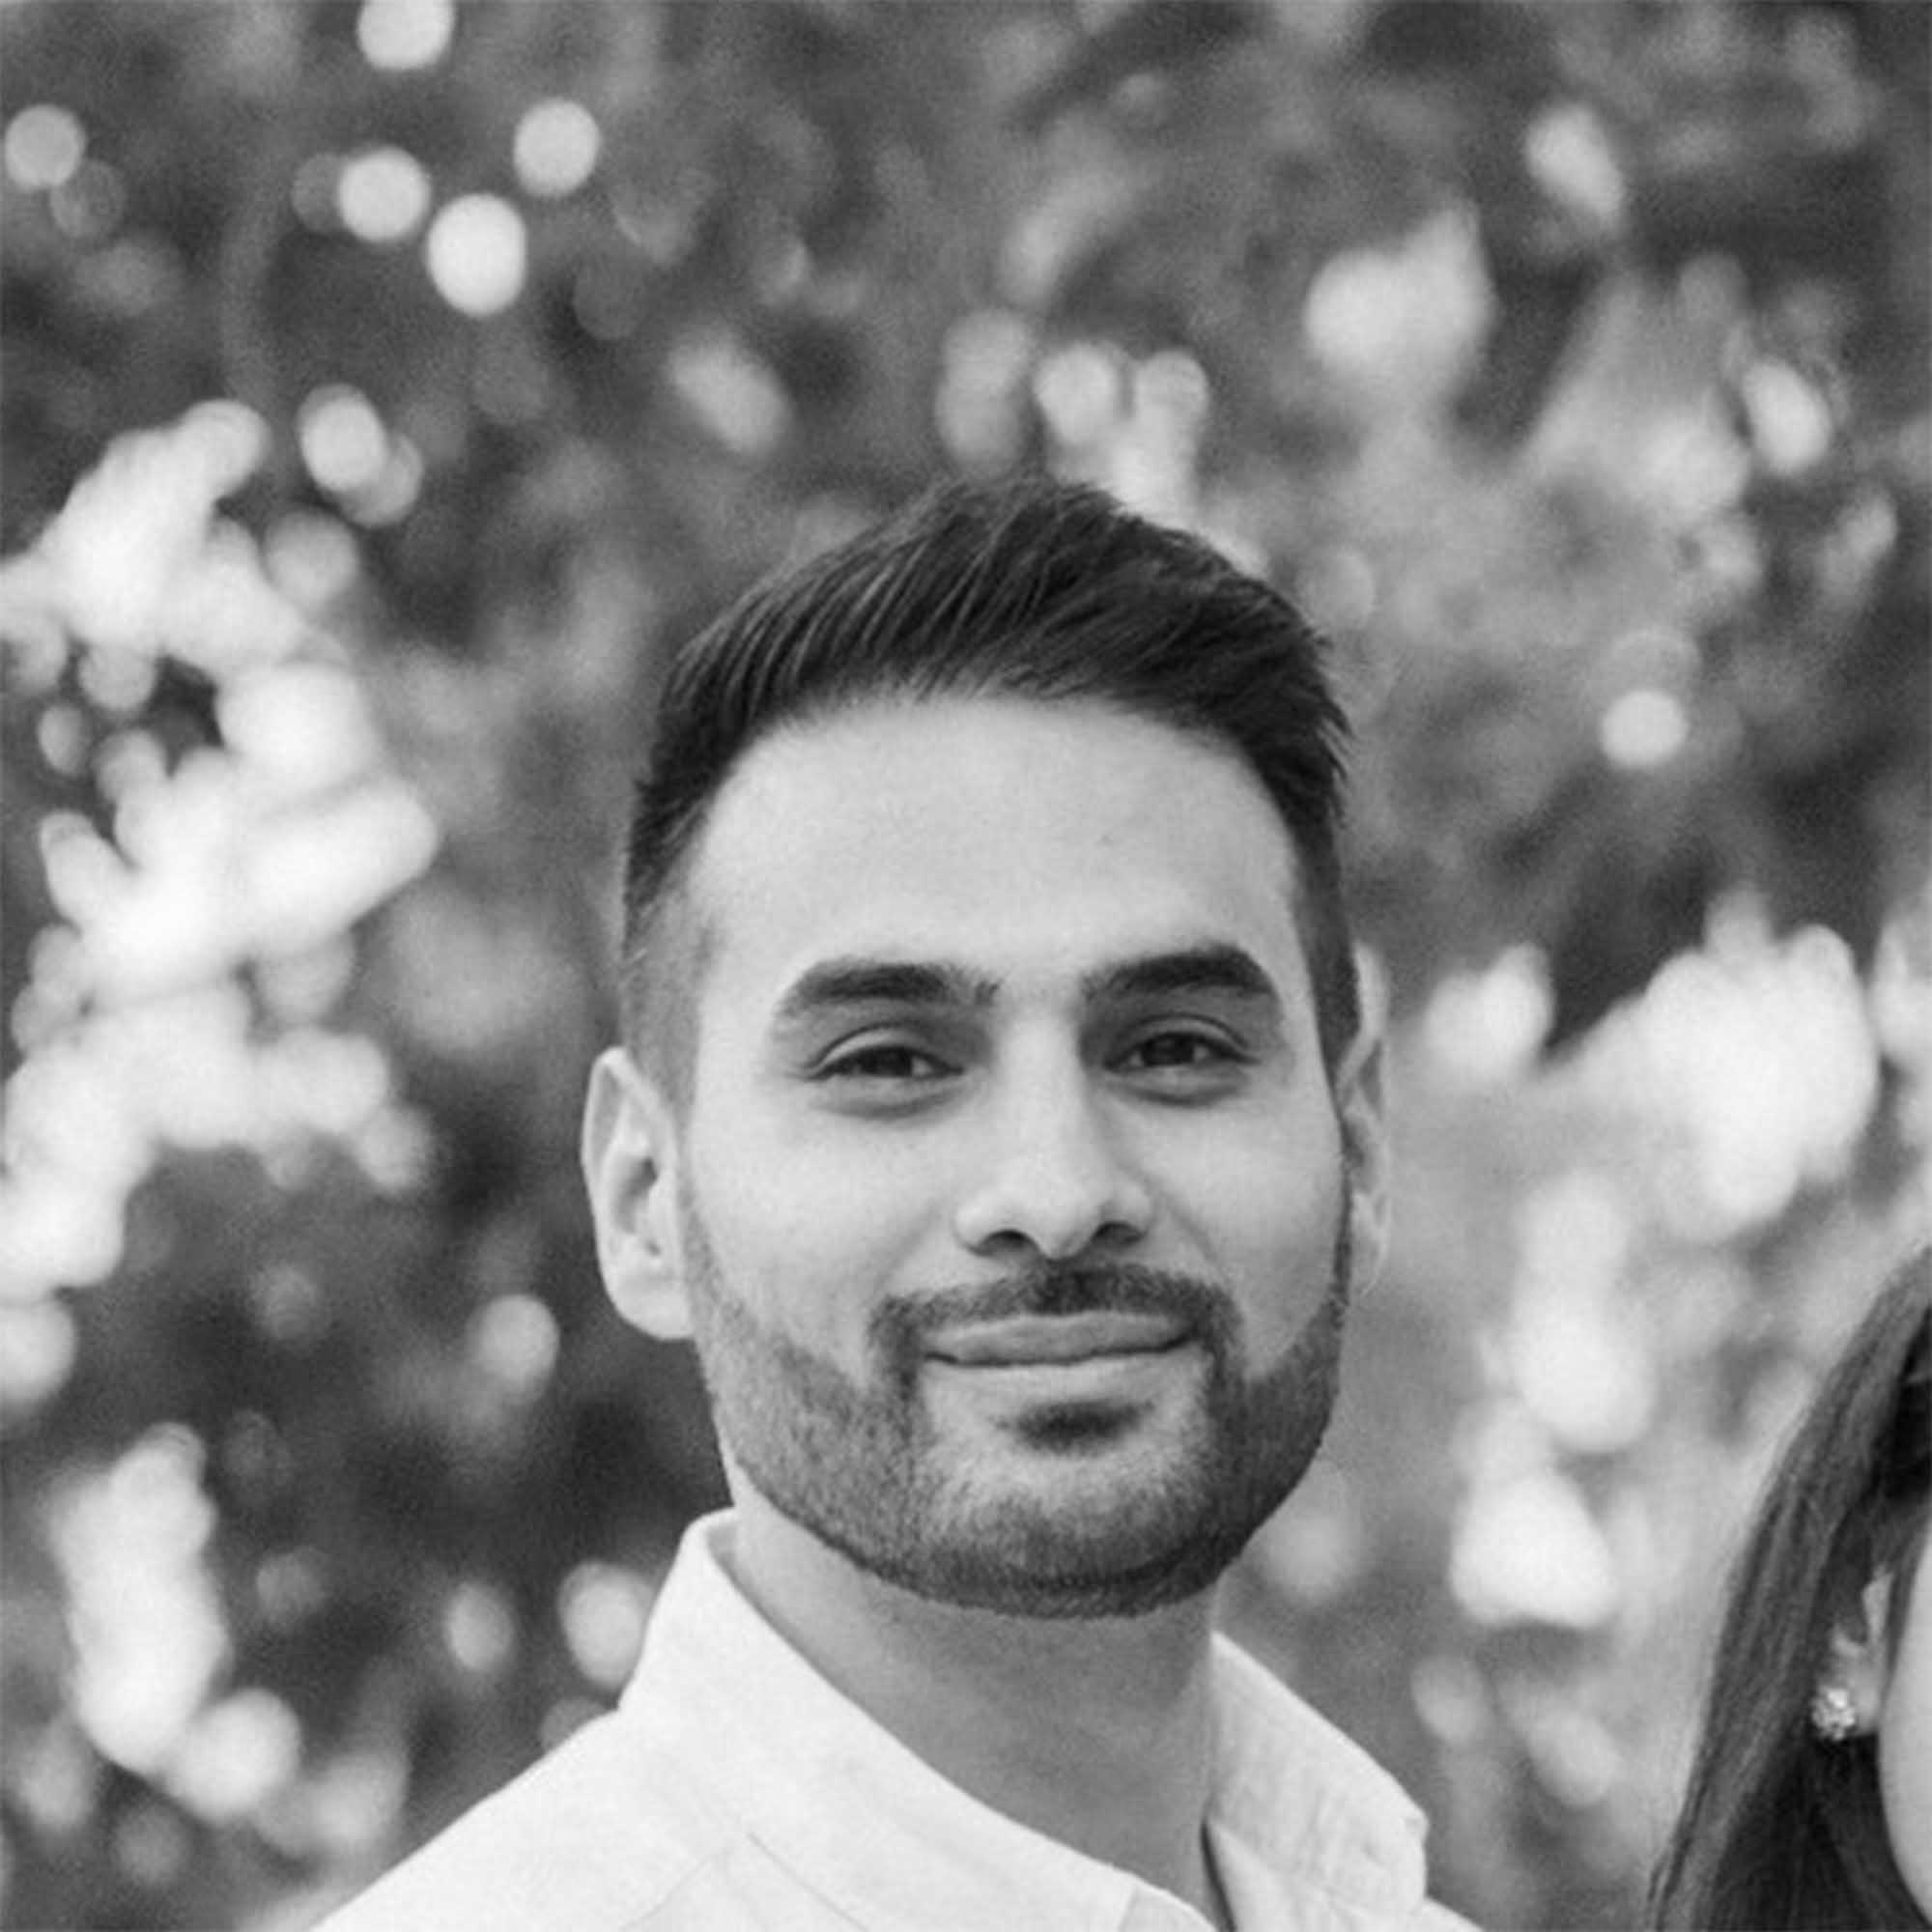 Saad Shahzad - GM, Enterprise at Clutter